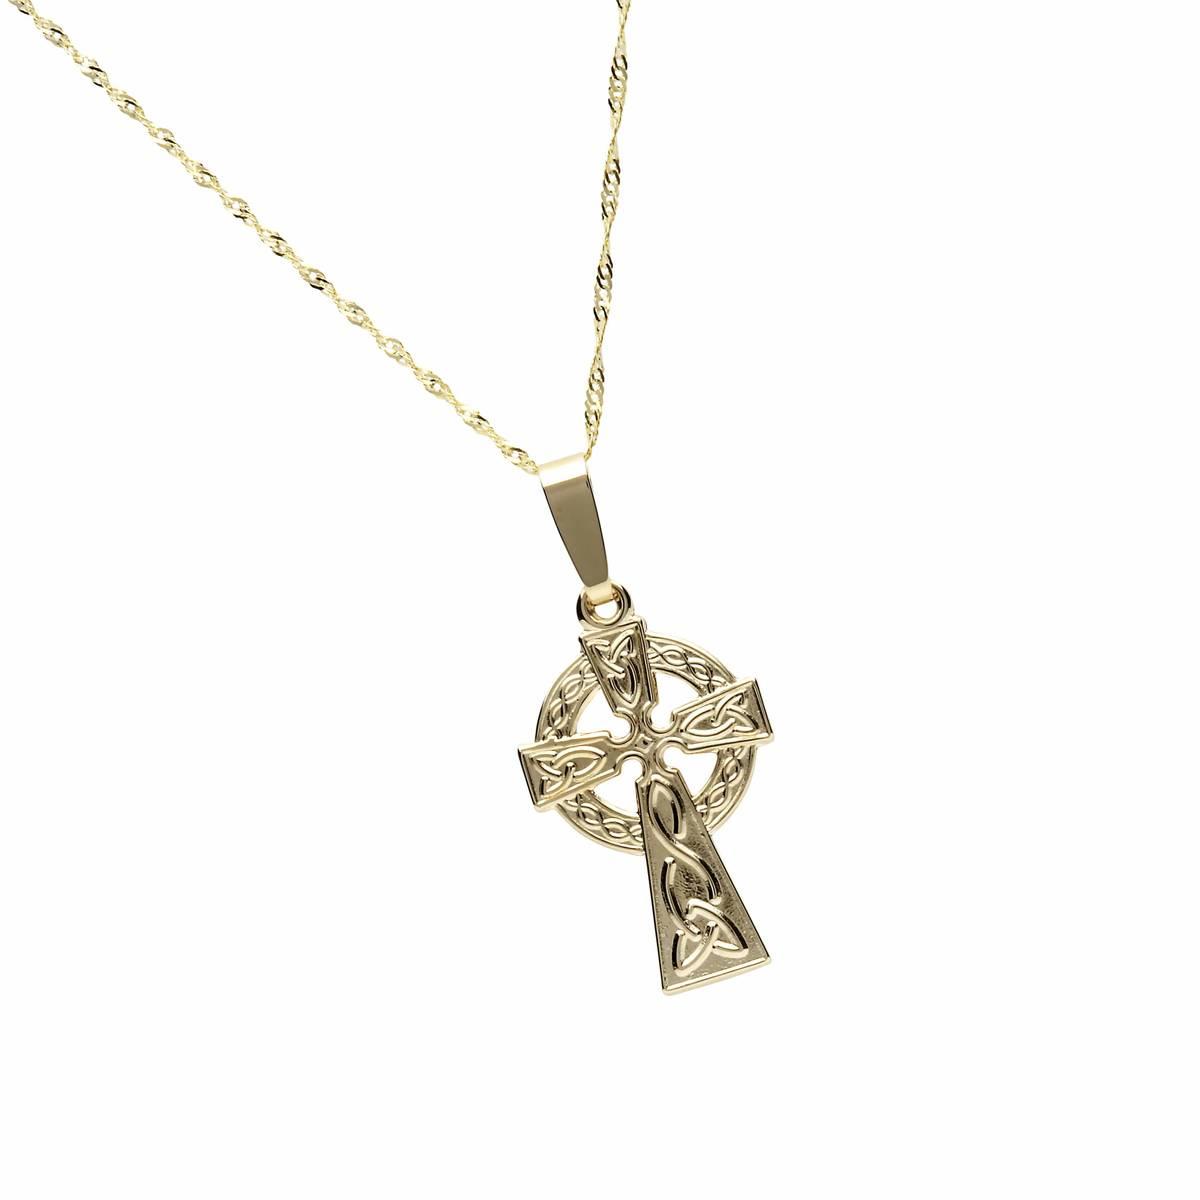 10 carat yellow gold classic Celtic cross pendant